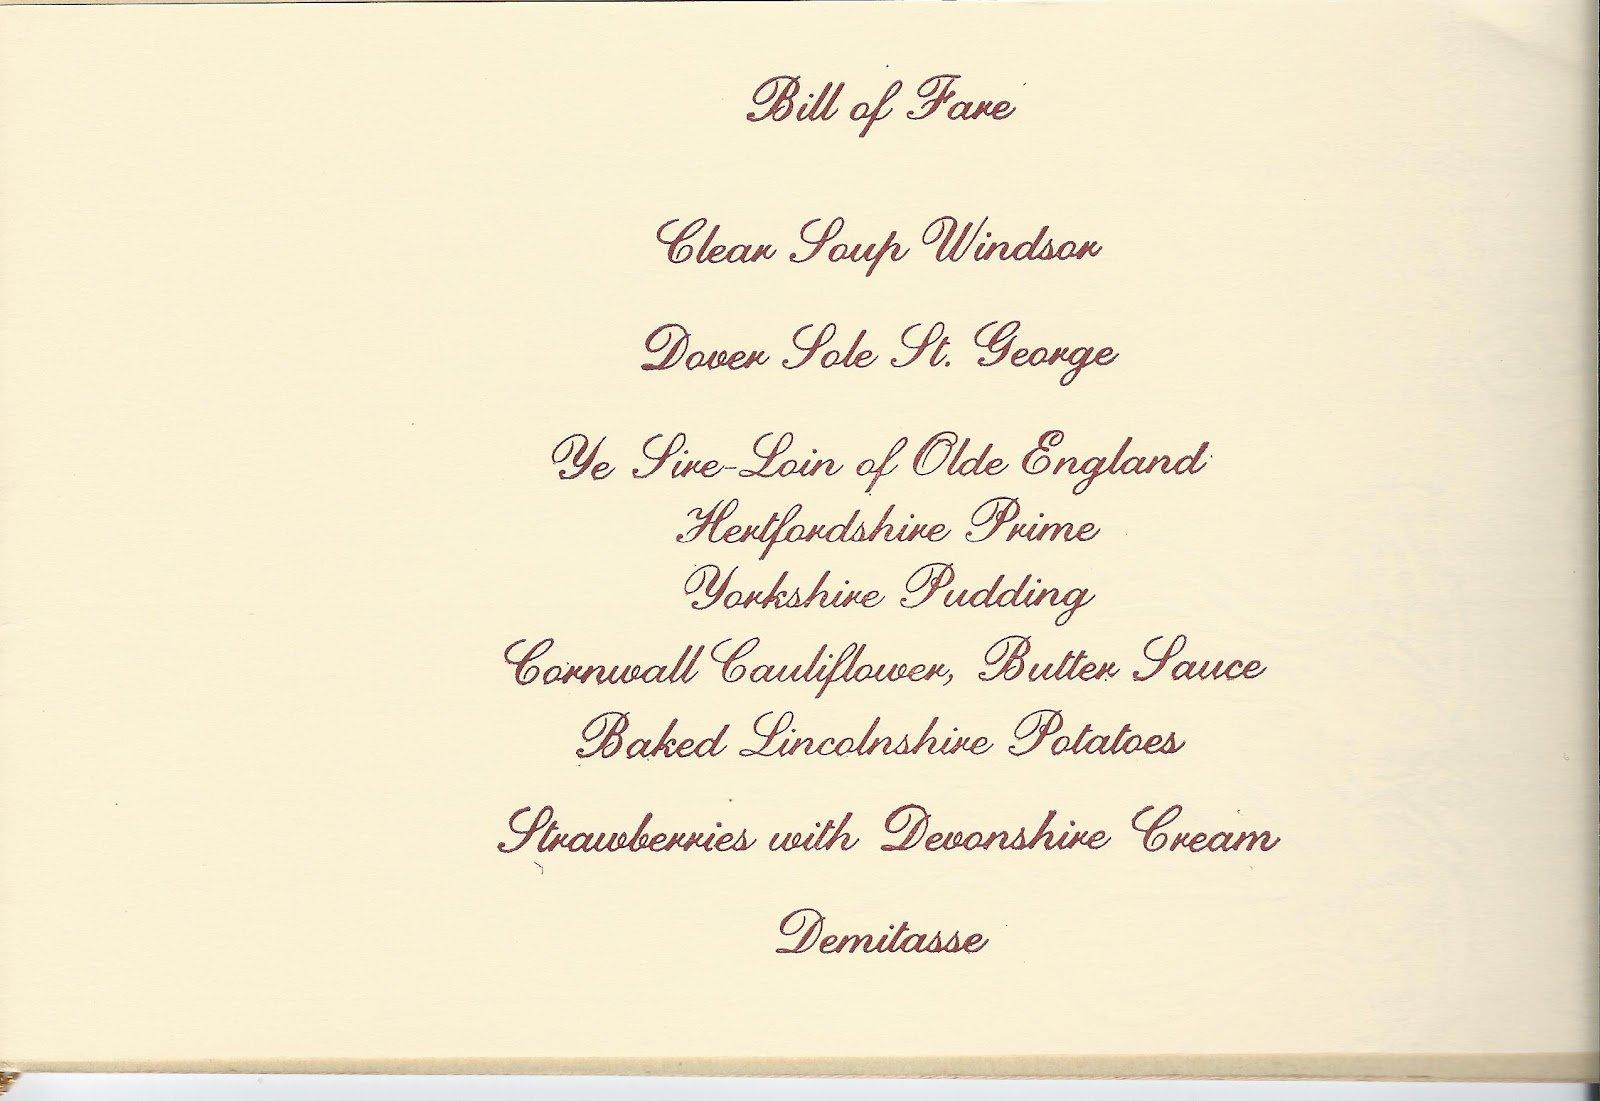 Banquet Dinner Invitation Wording